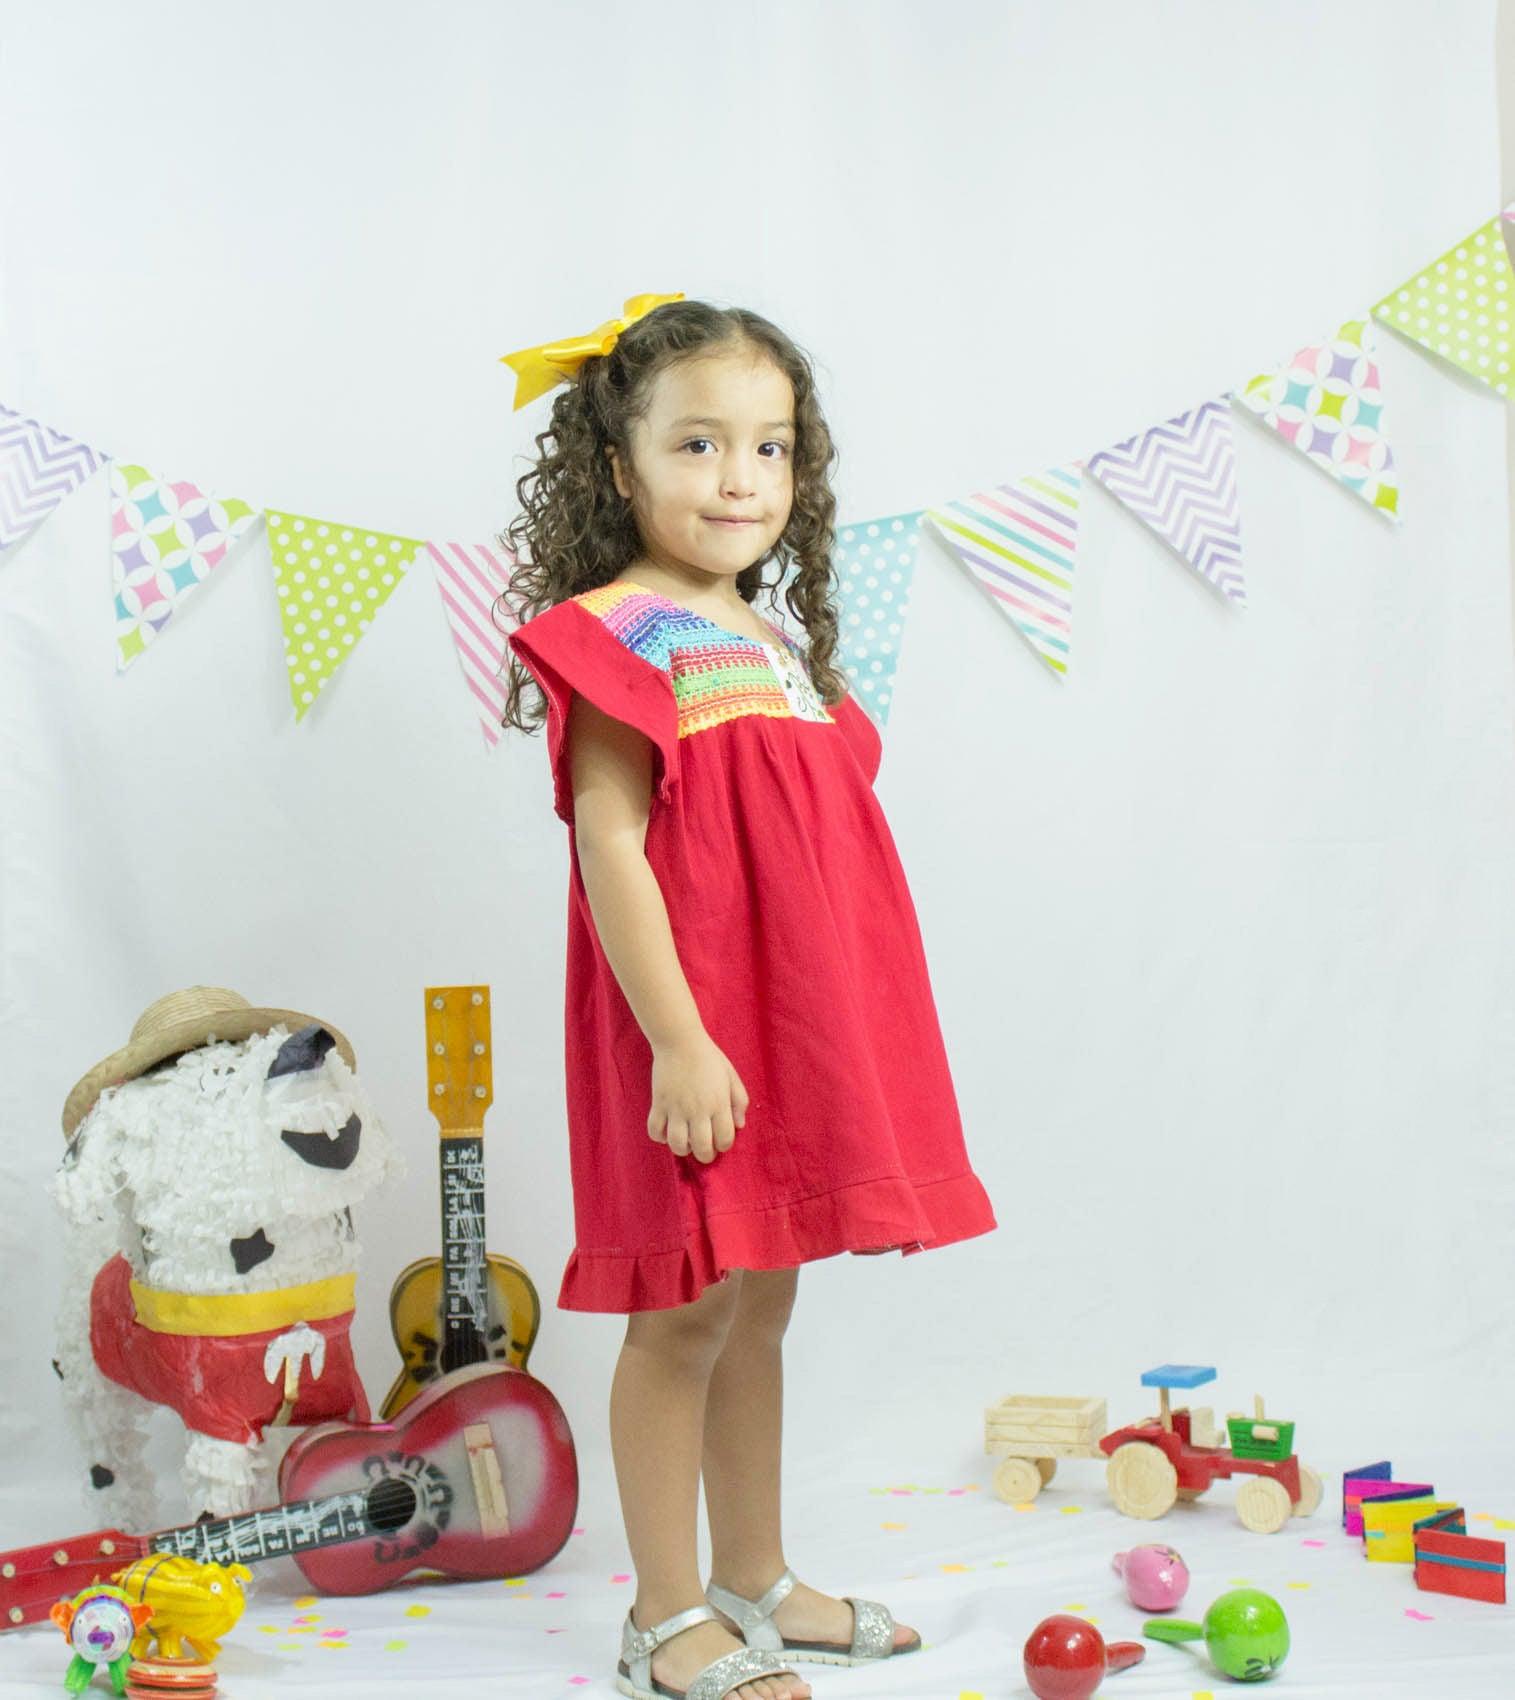 Mexican party - Girl - 4 years old - fiesta - folk - baby - birthday ... 6eccd8fdb7a